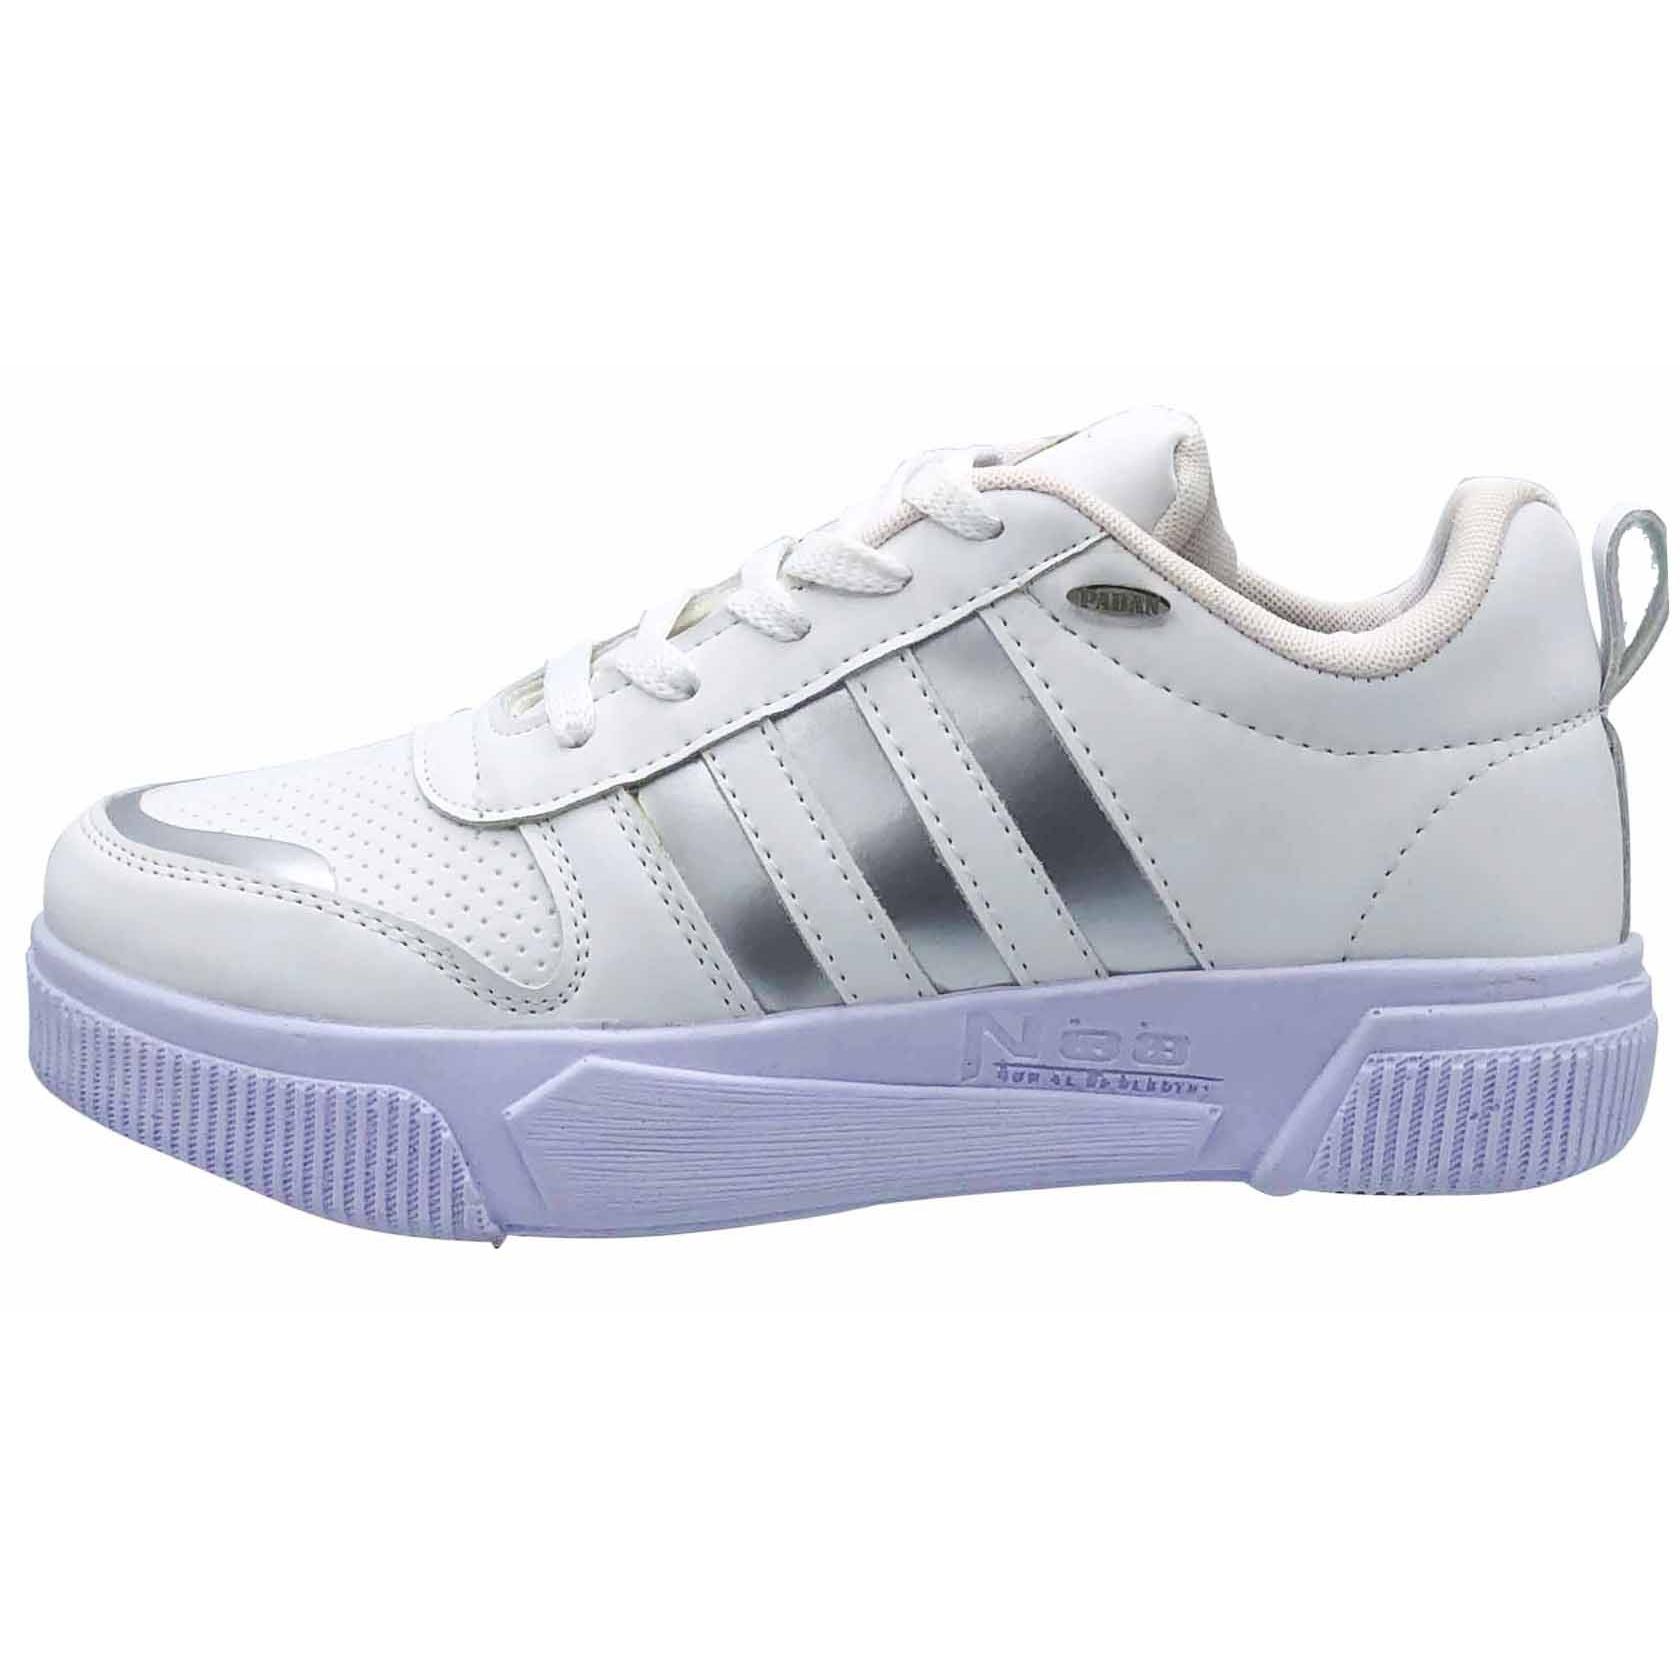 کفش مخصوص پیاده روی زنانه پابان کد N 300